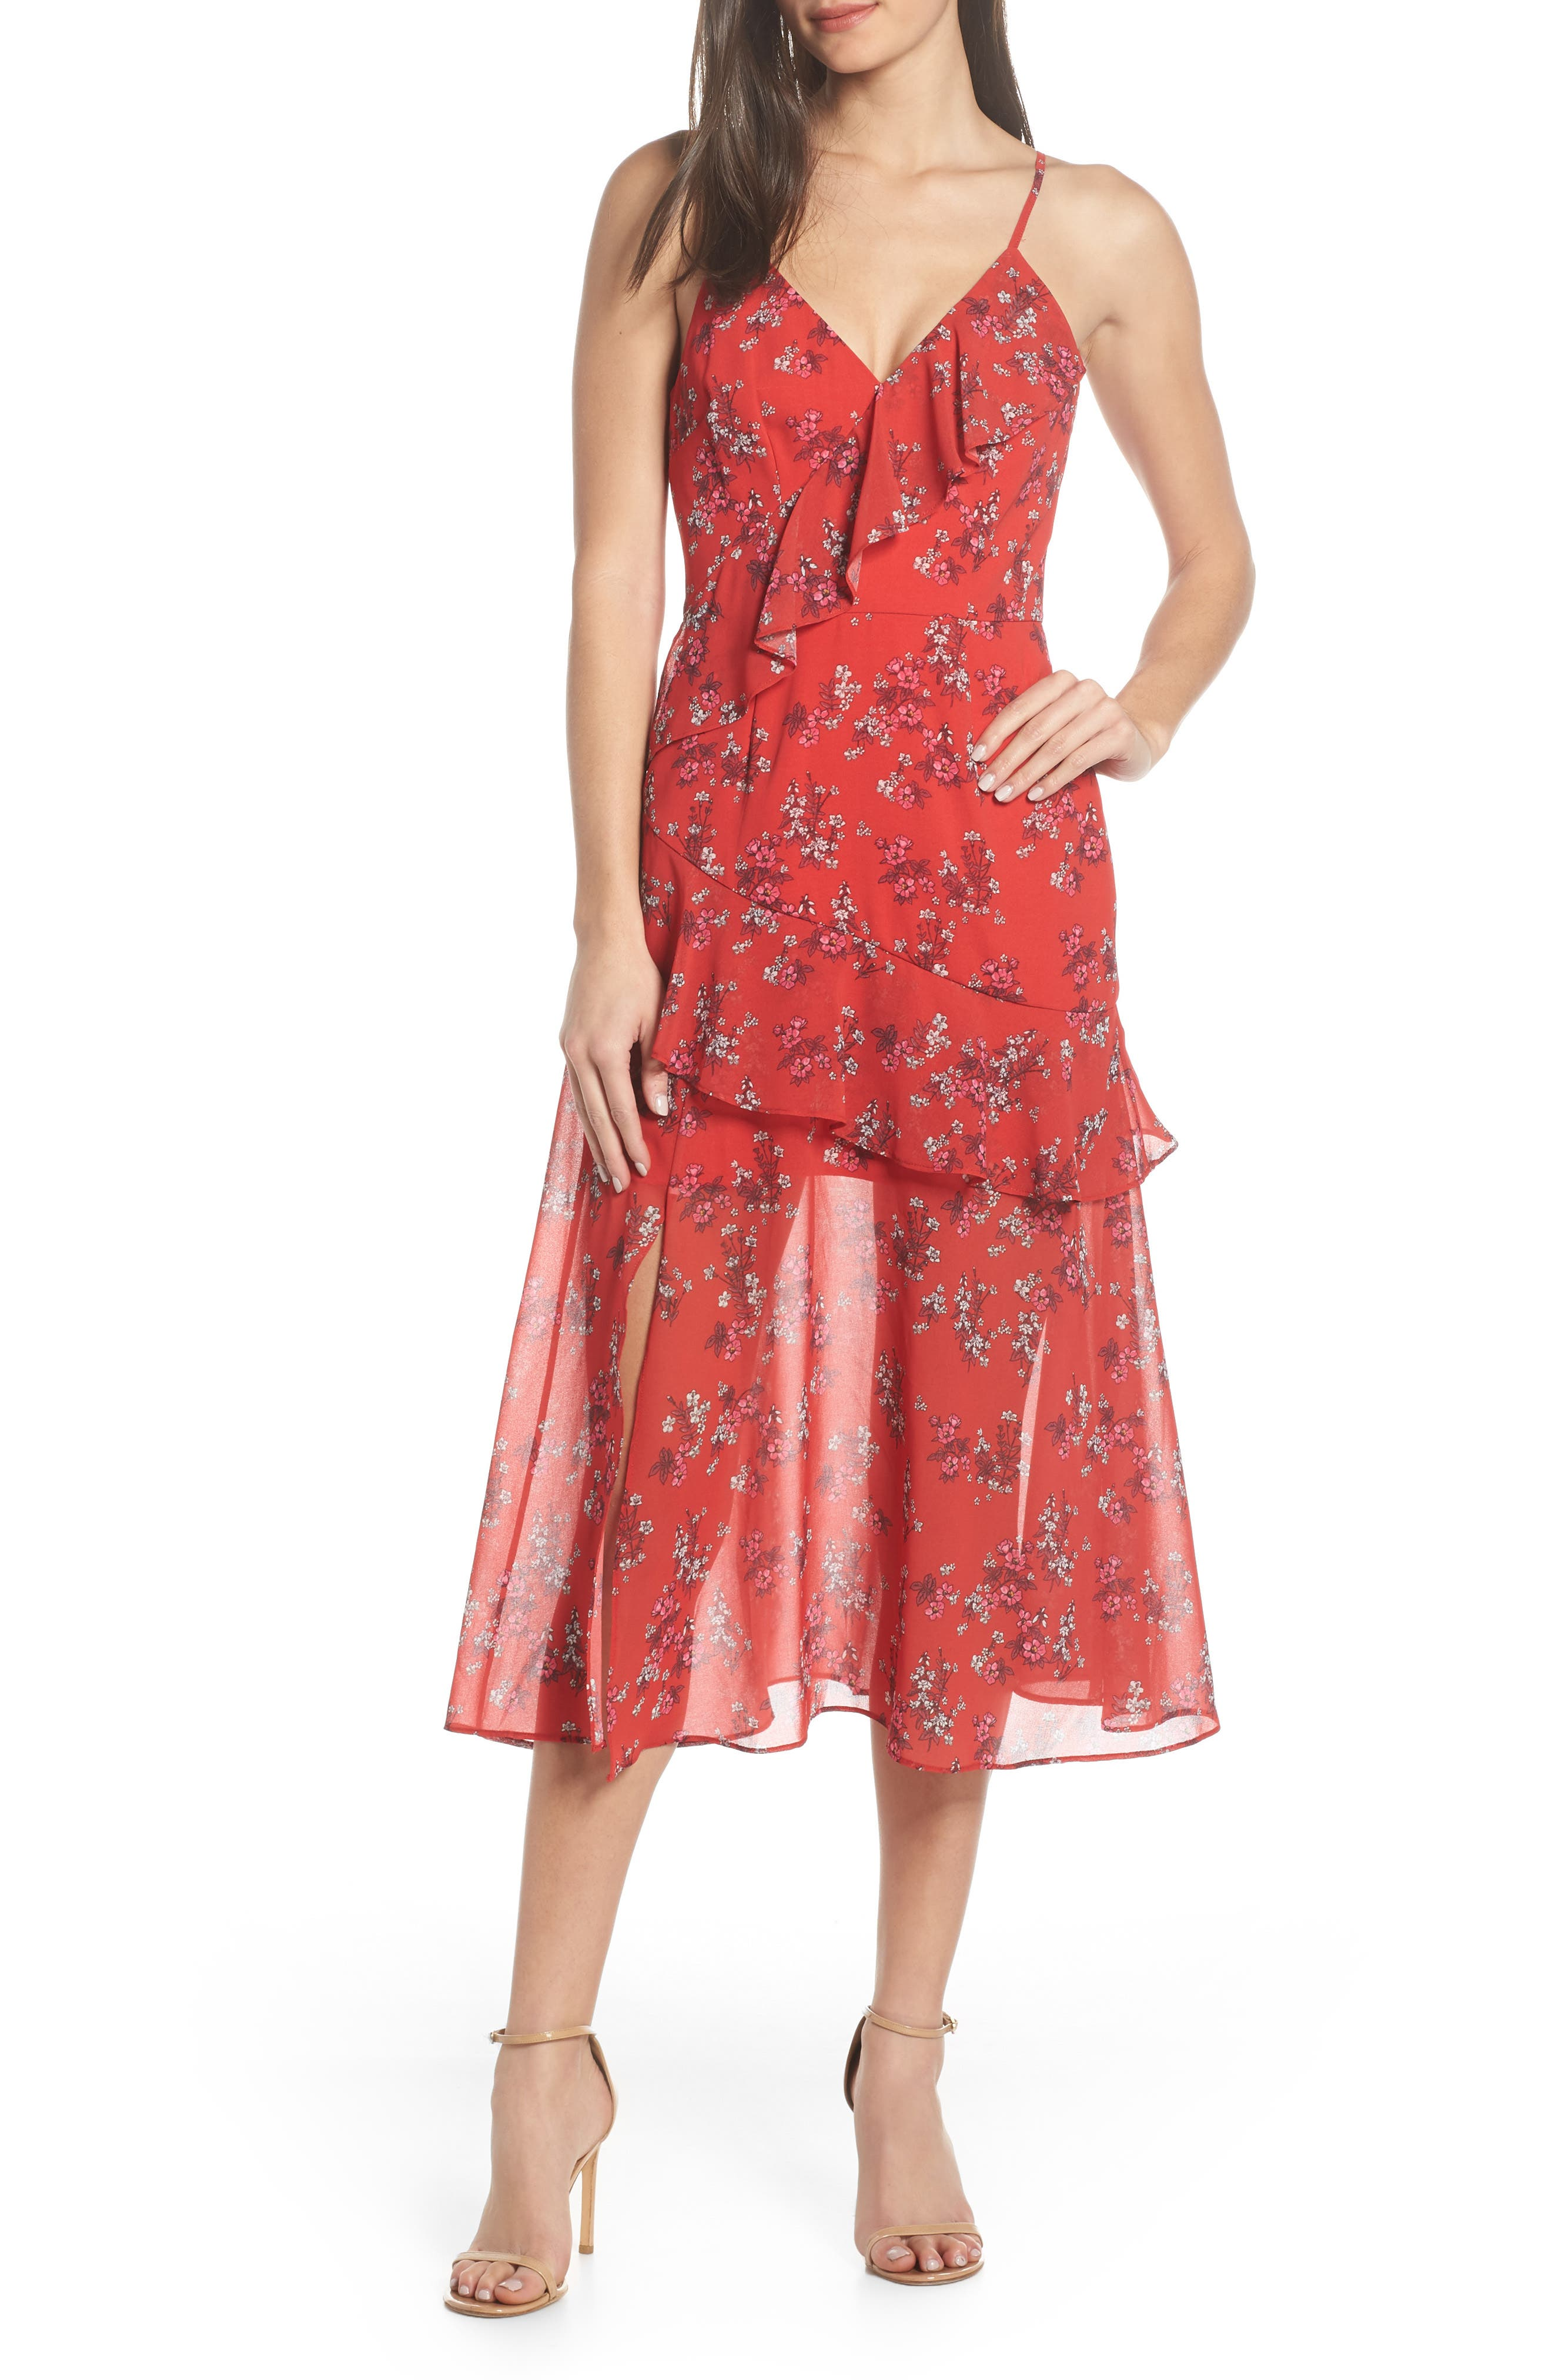 KEEPSAKE THE LABEL,                             Heart & Soul Ruffle Detail Tea Length Dress,                             Main thumbnail 1, color,                             SMALL RED FLORAL